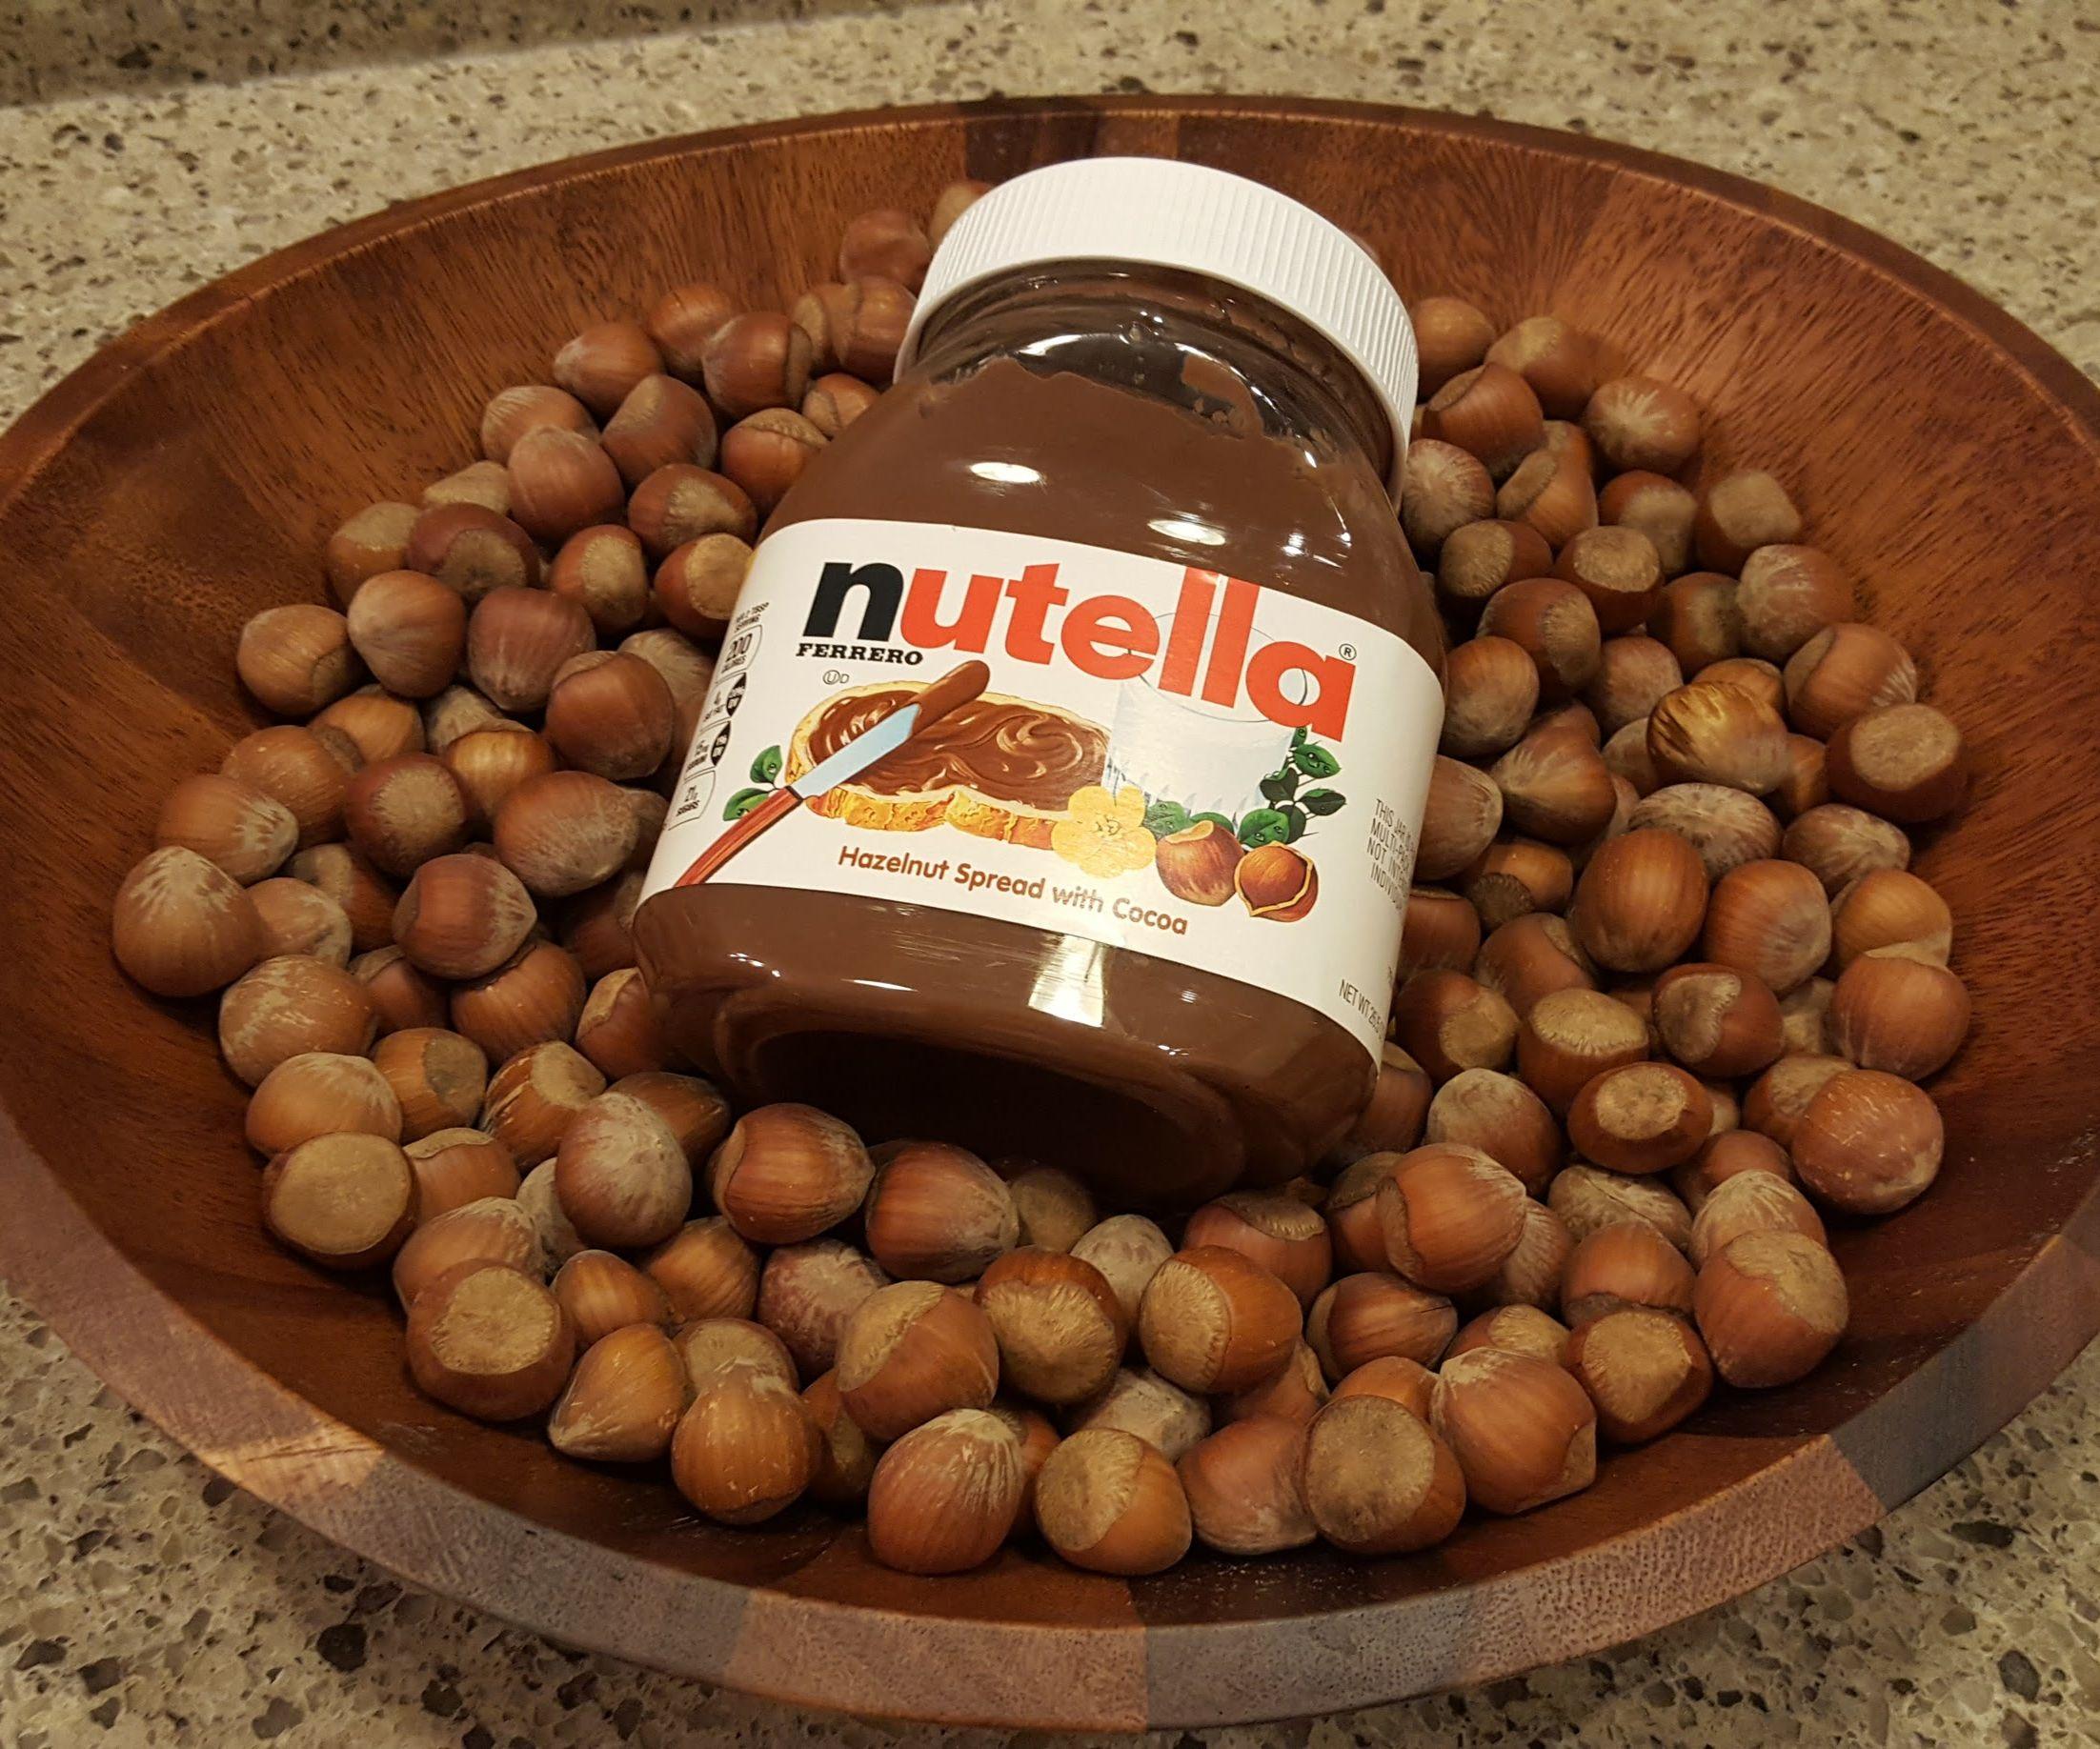 Knockoff Nutella